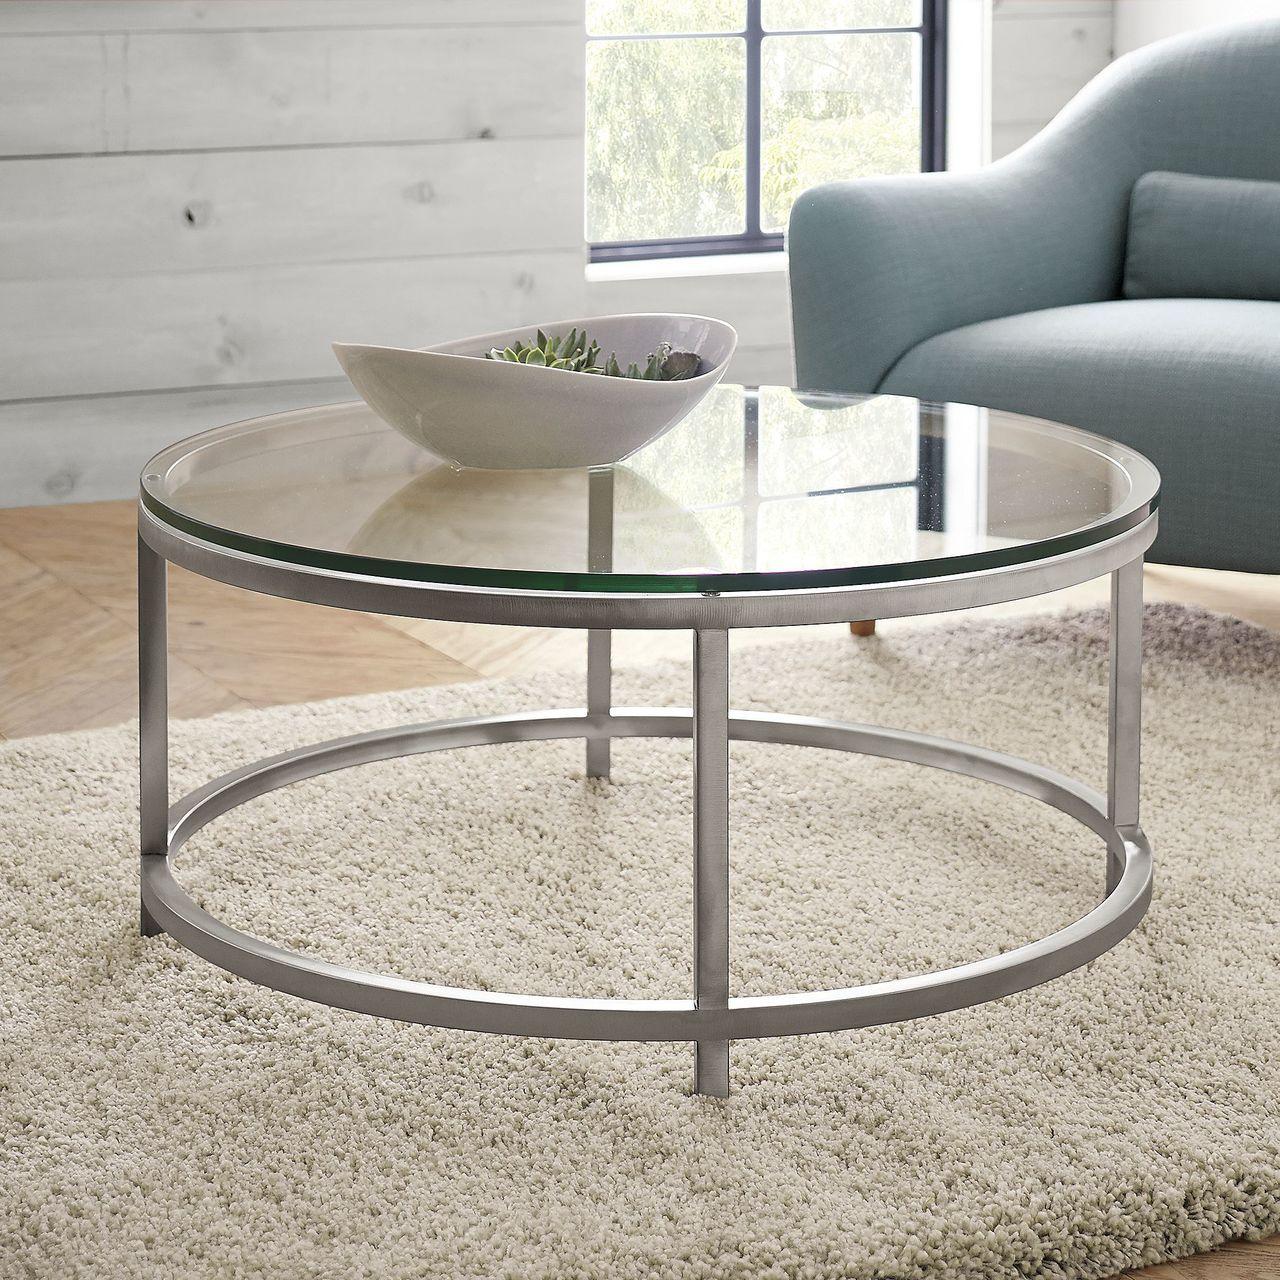 Era系列圓形咖啡桌,原價23,000元,特價1萬3,685元。圖/Crate ...